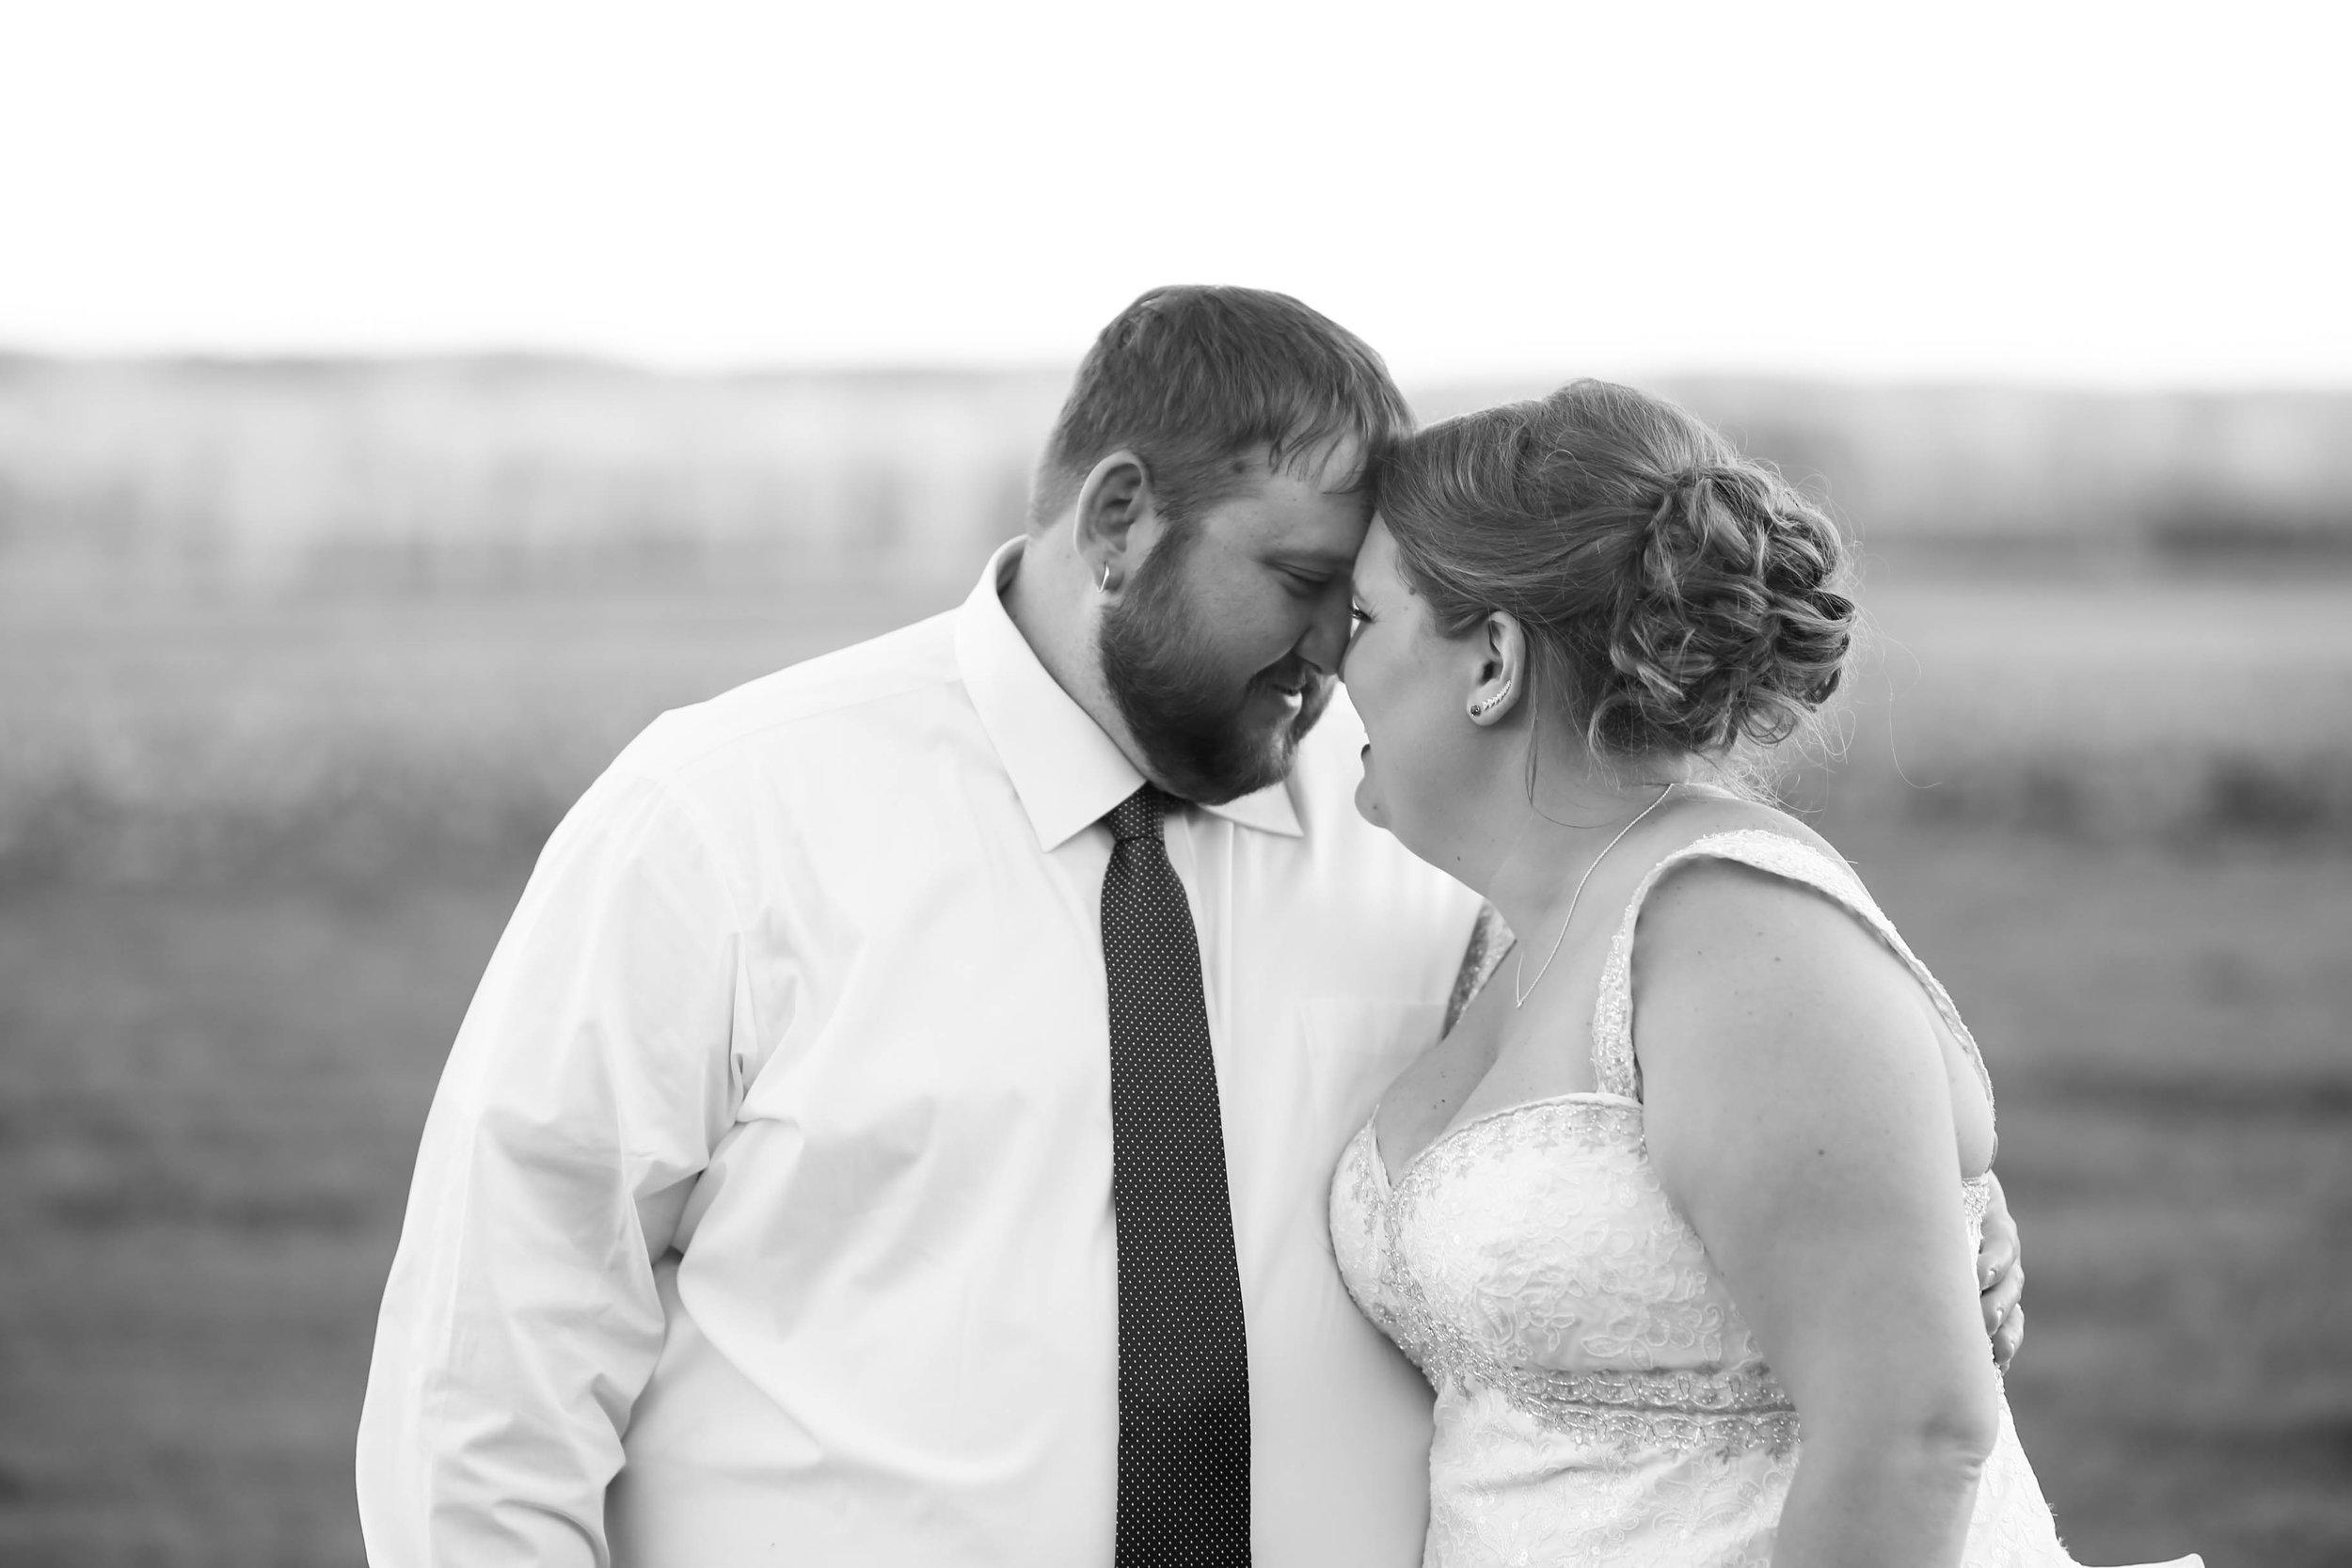 Jesse and Brenna-437.jpg